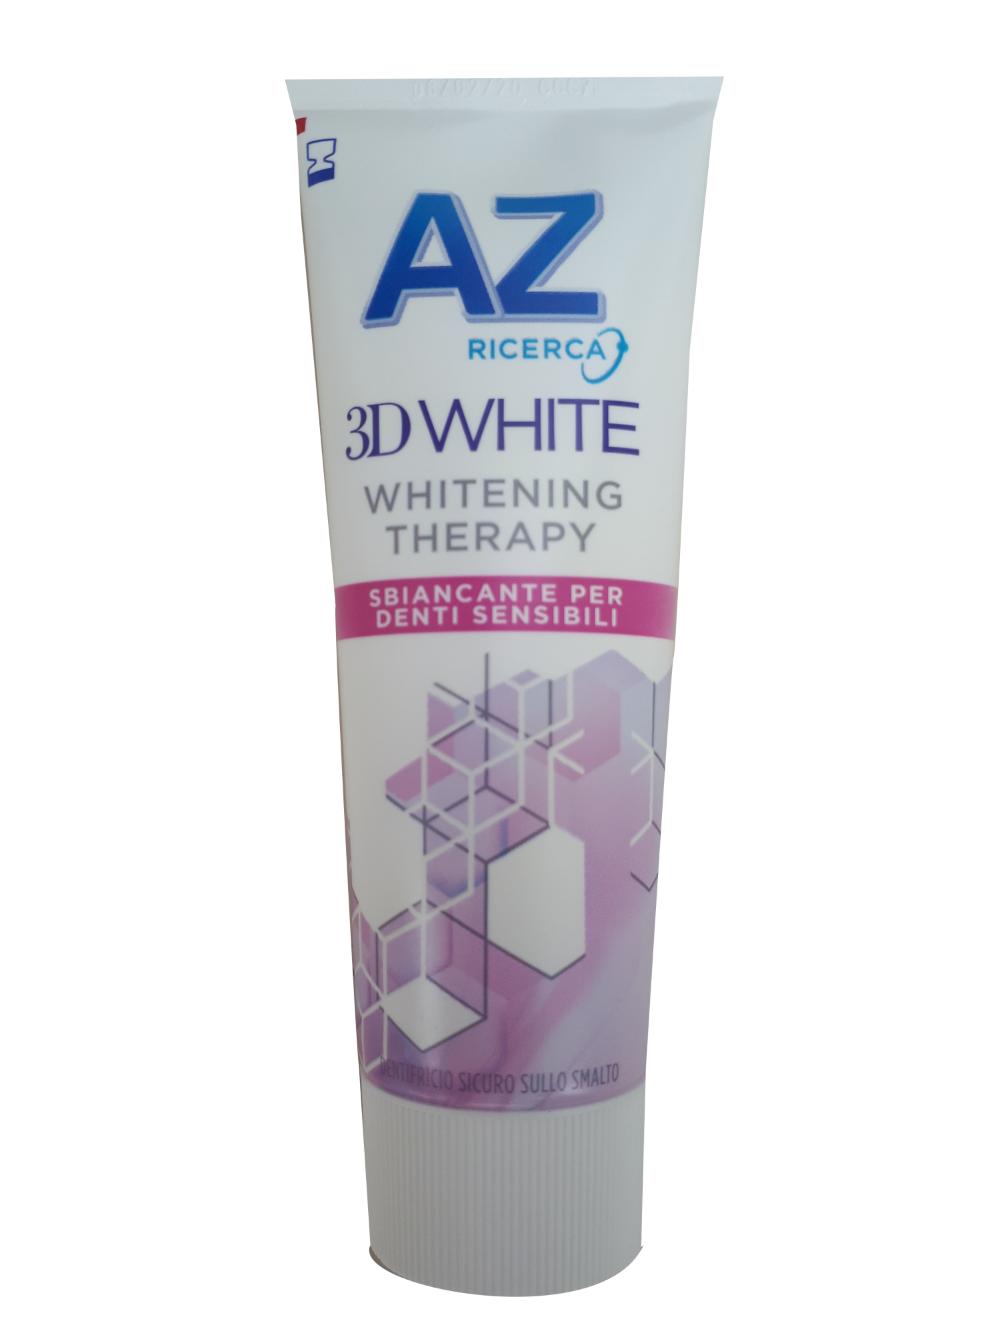 Procter & Gamble AZ 3D White whitening therapy dentifricio sbiancante per denti sensibili (75 ml)